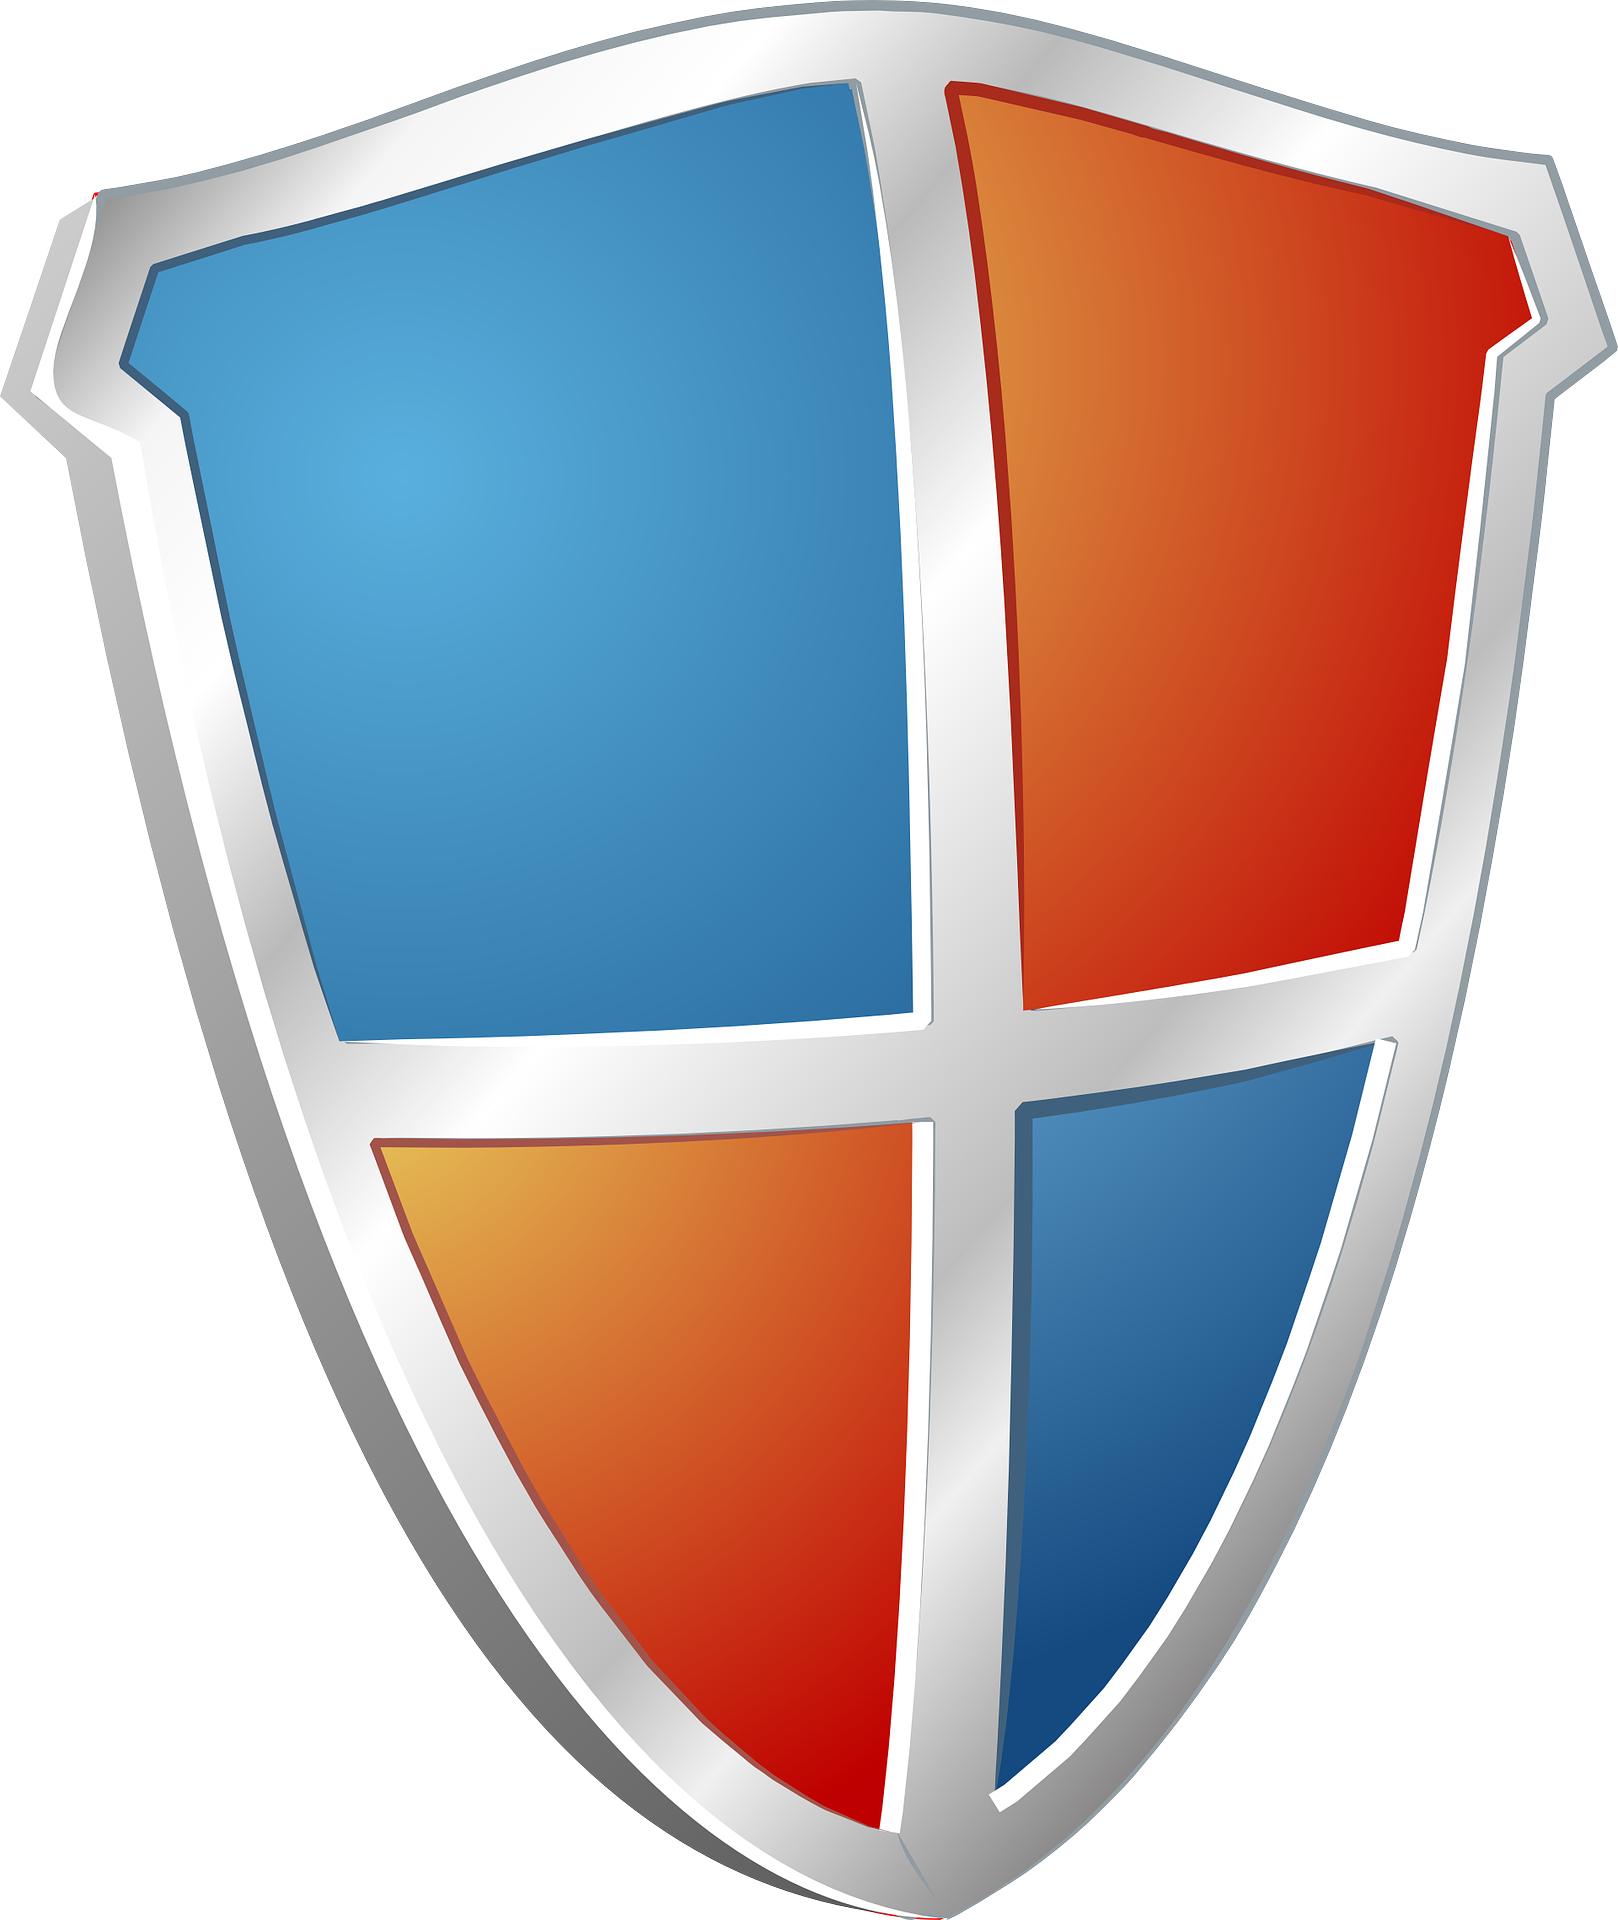 Cartoon shield vector